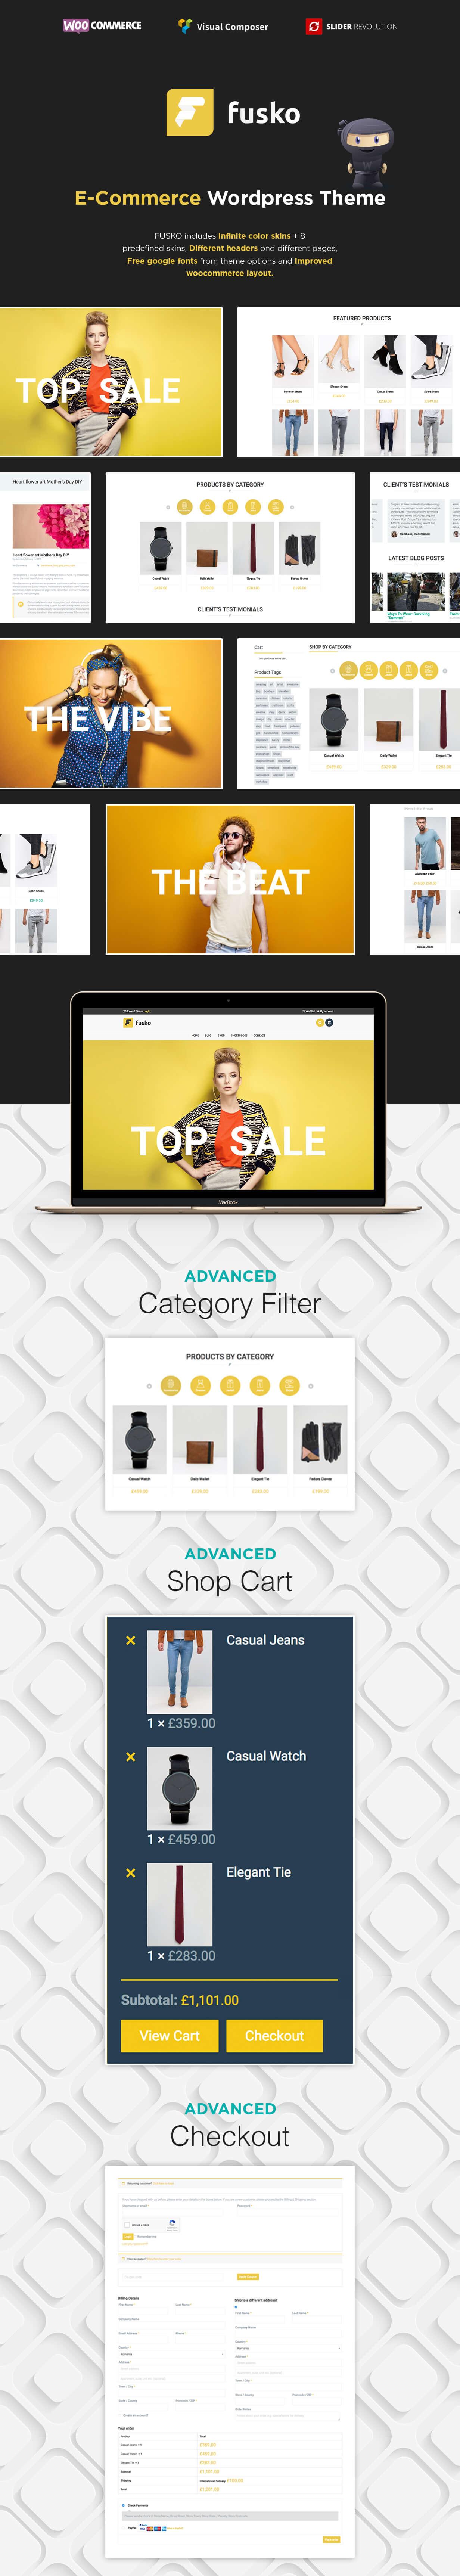 Fusko - Tech/Gadgets WooCommerce WordPress Theme - 4